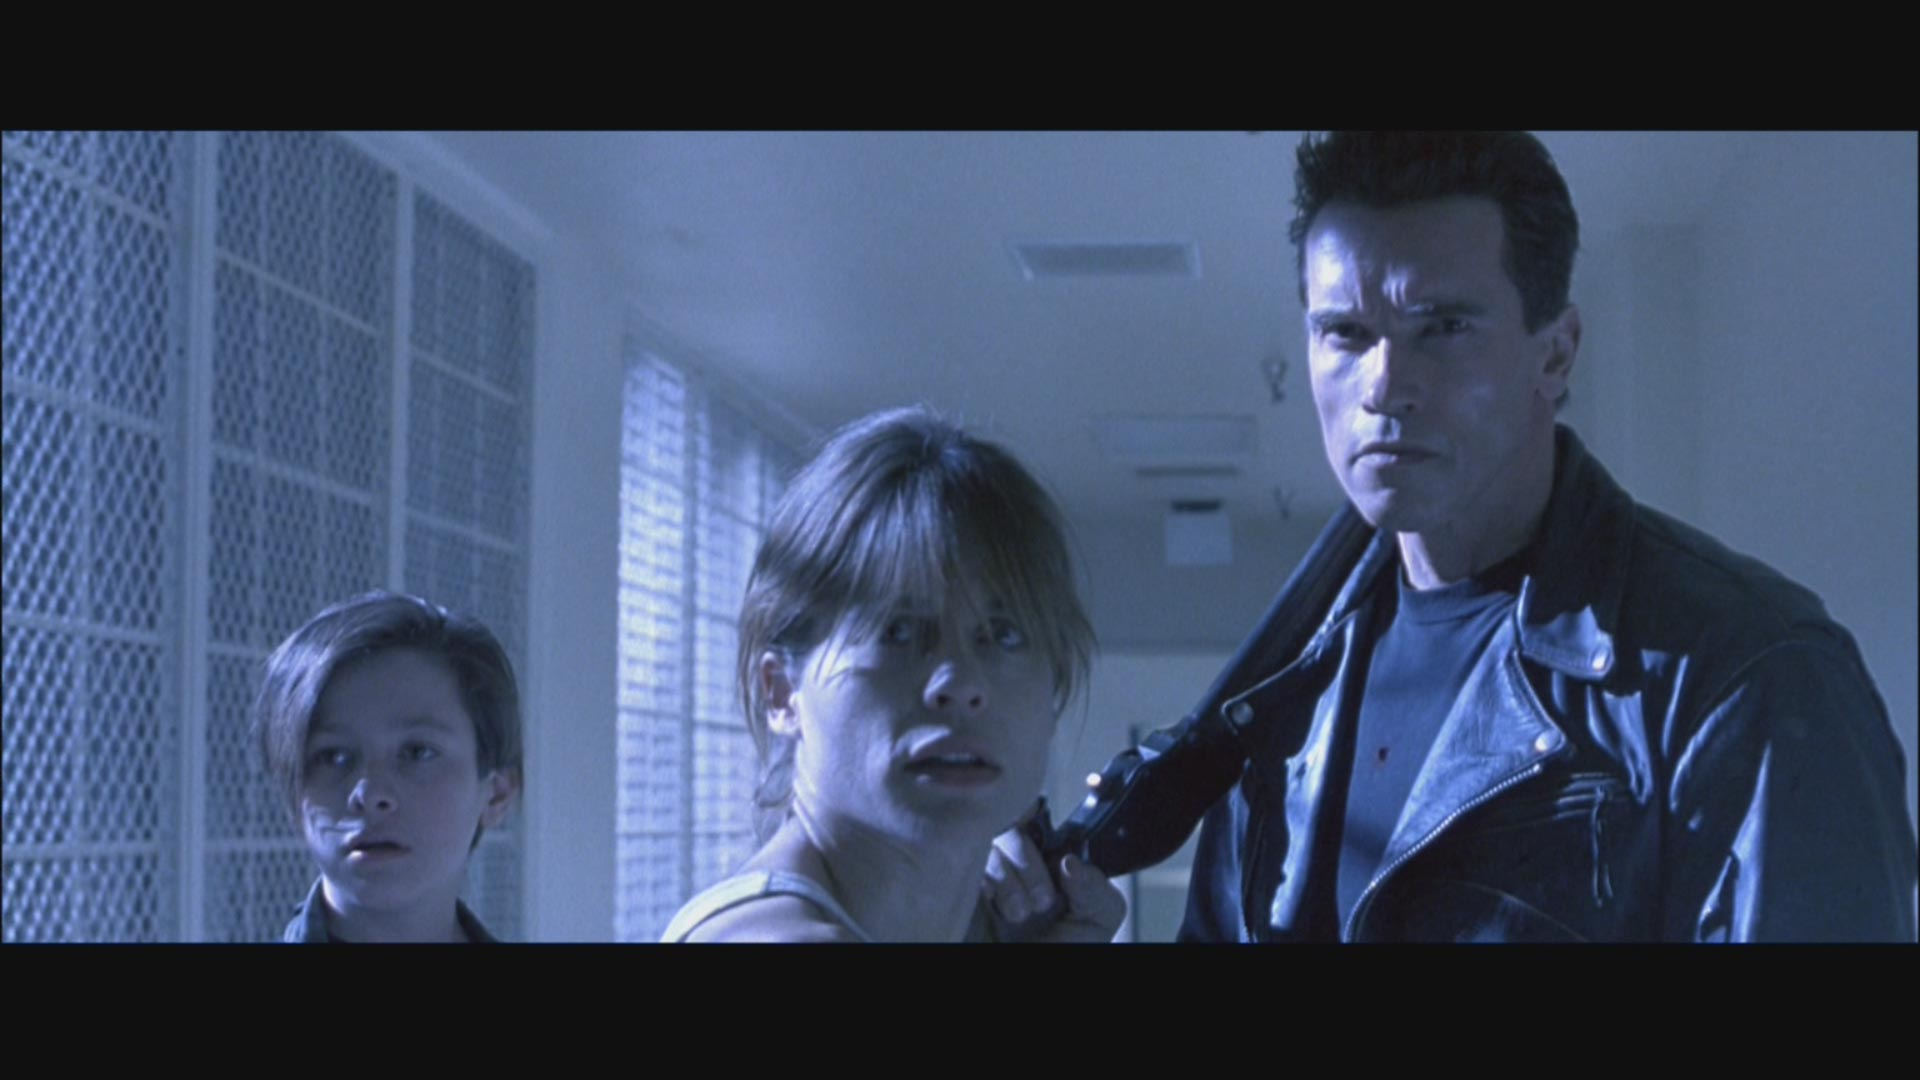 Linda Hamilton to Return to the Terminator Franchise